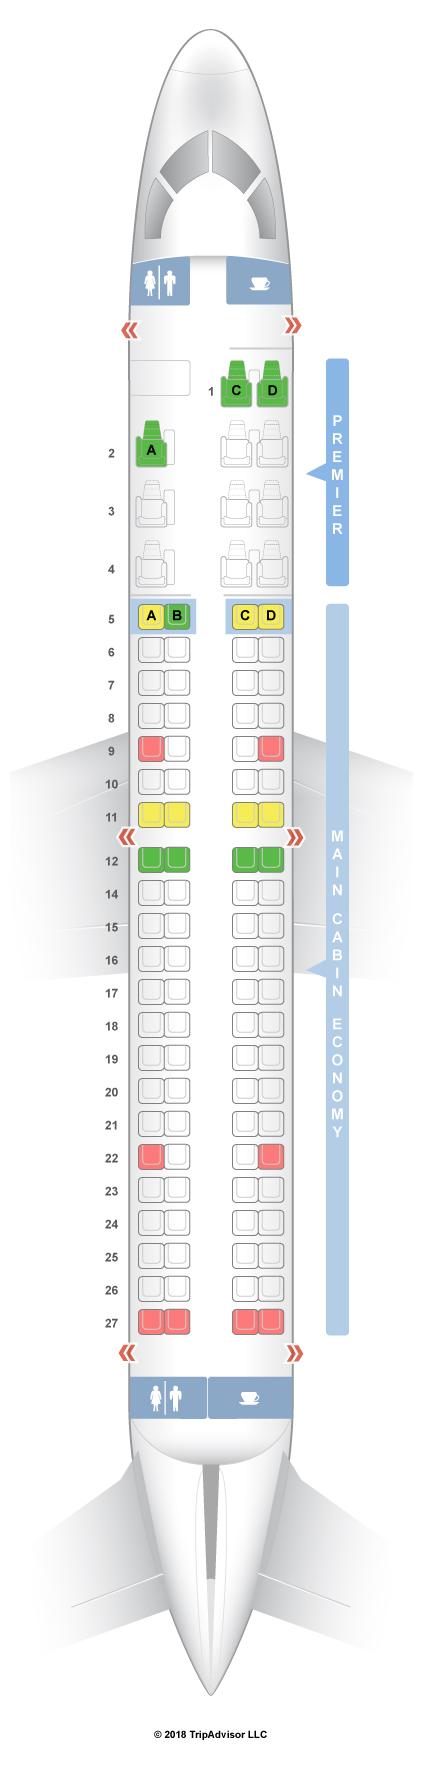 Seatguru Seat Map Aeromexico Embraer 190  E90  Layout 1